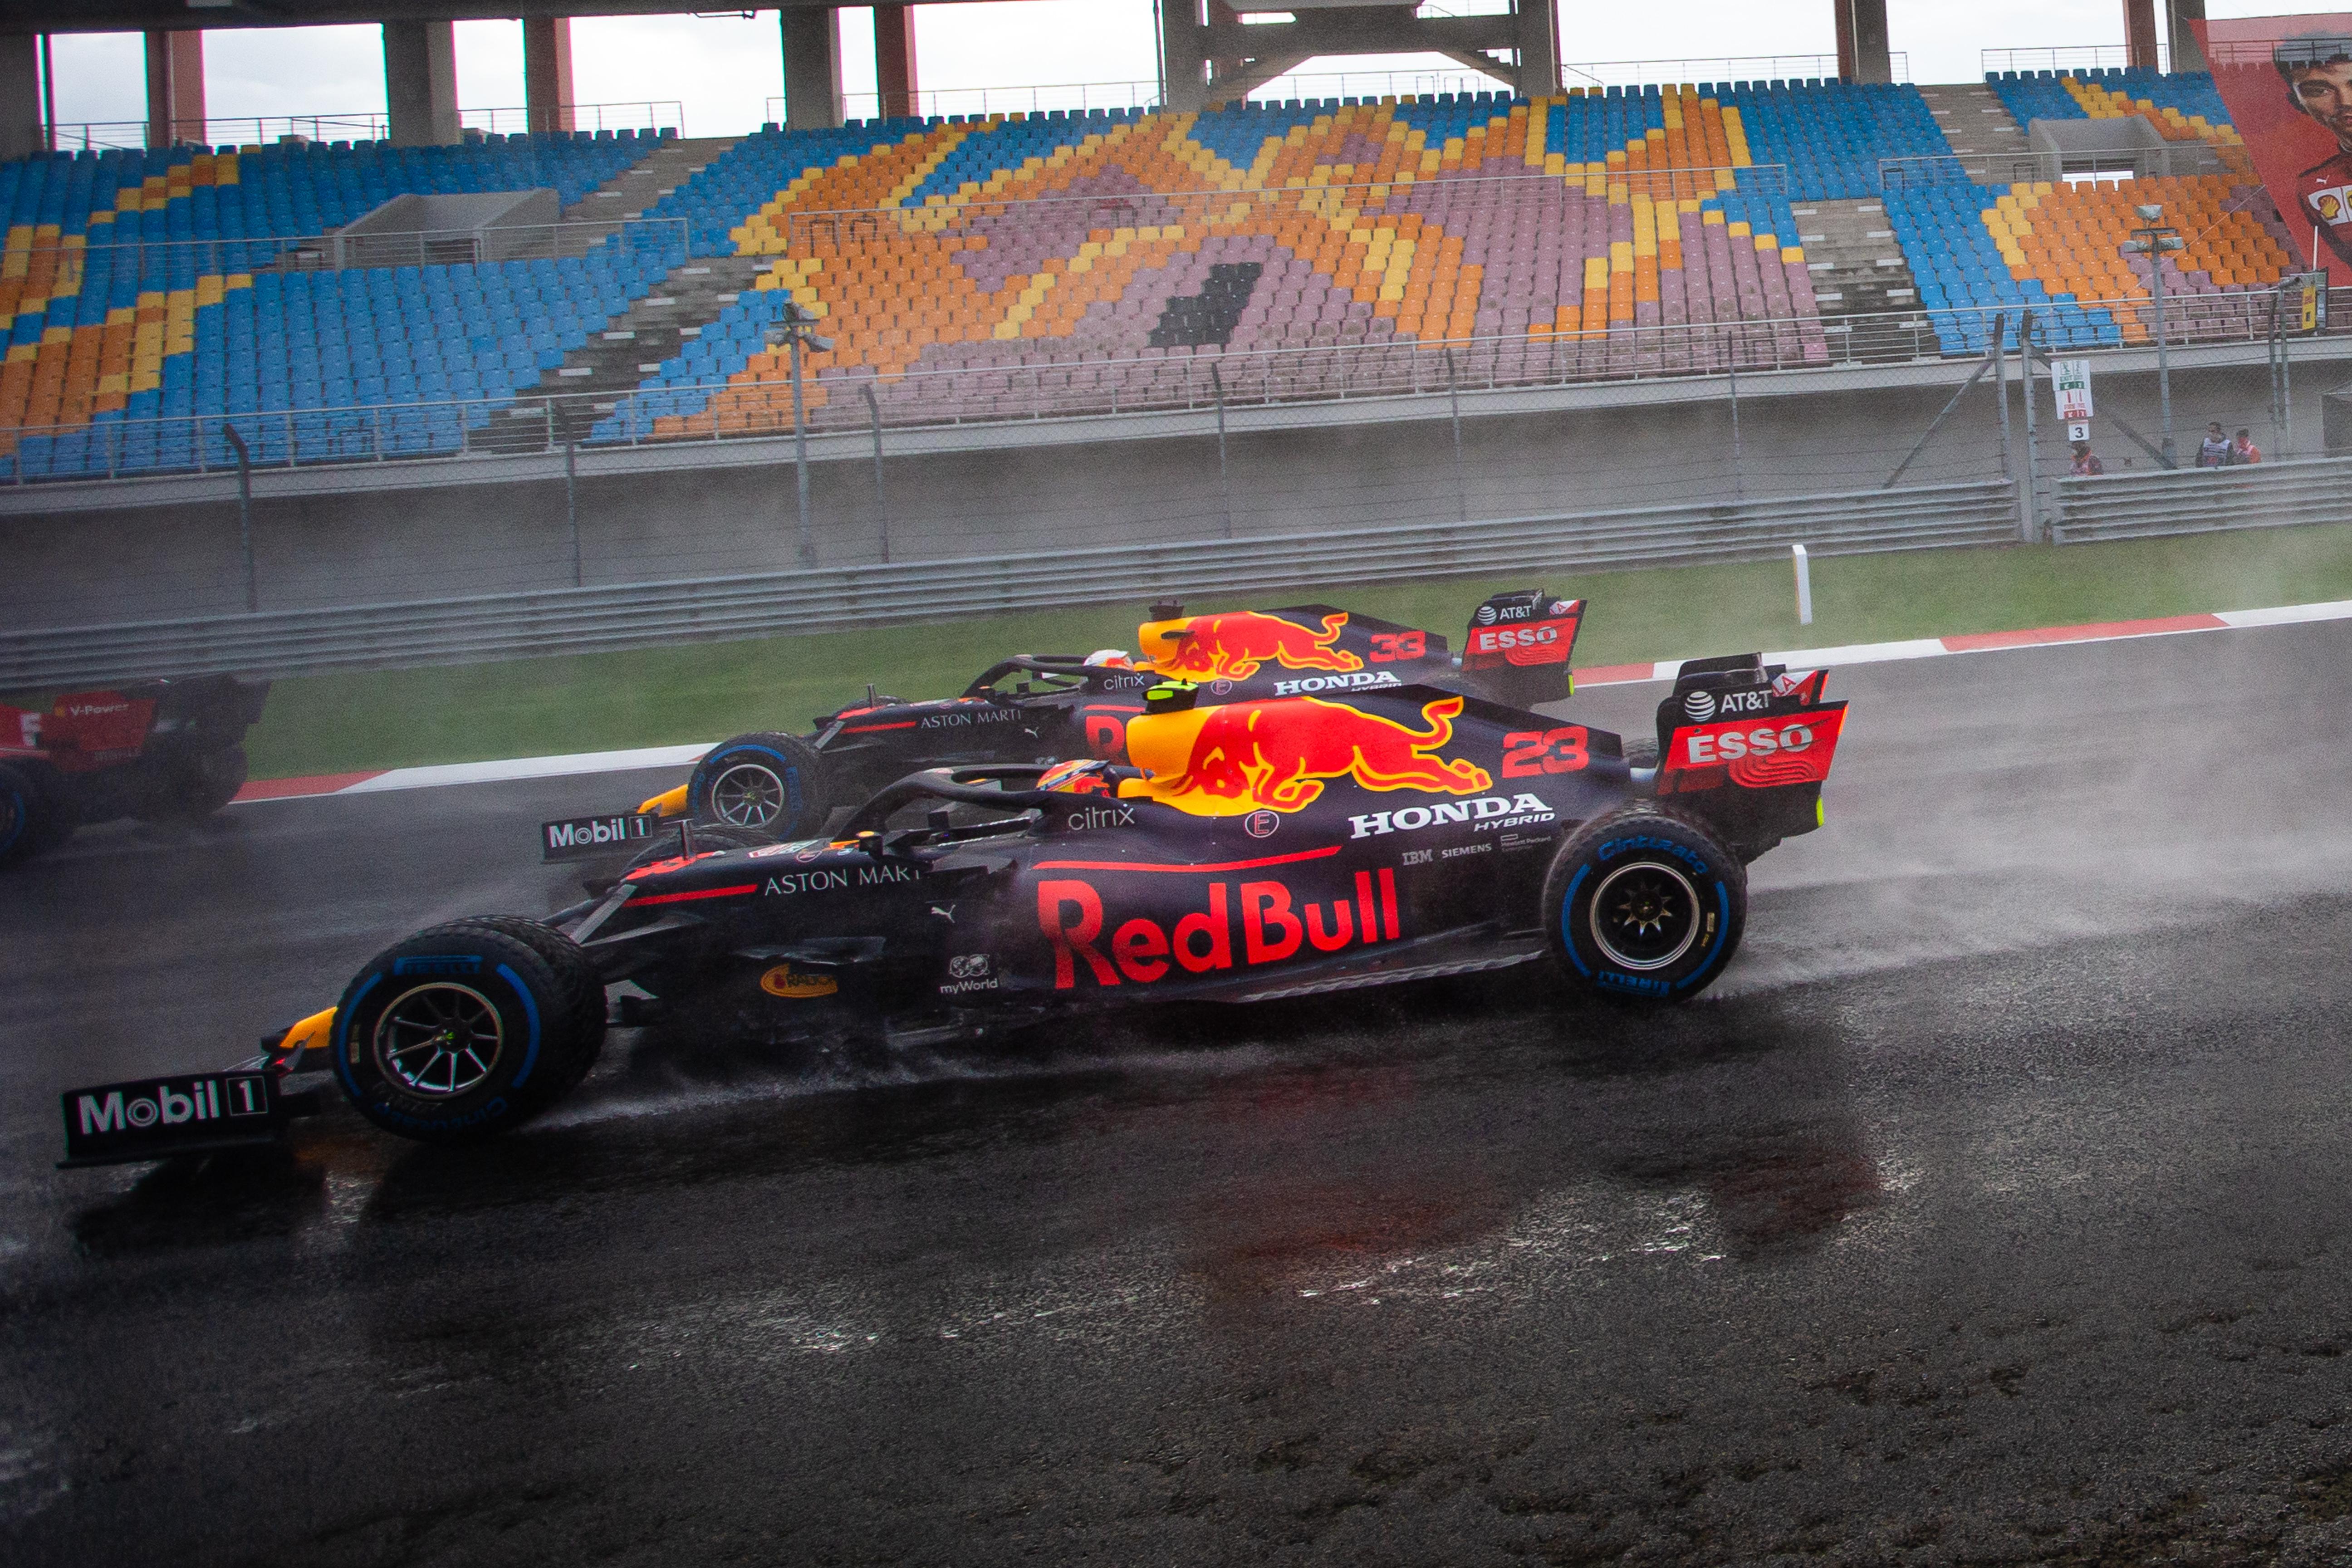 Max Verstappen Alex Albon Red Bull F1 2020